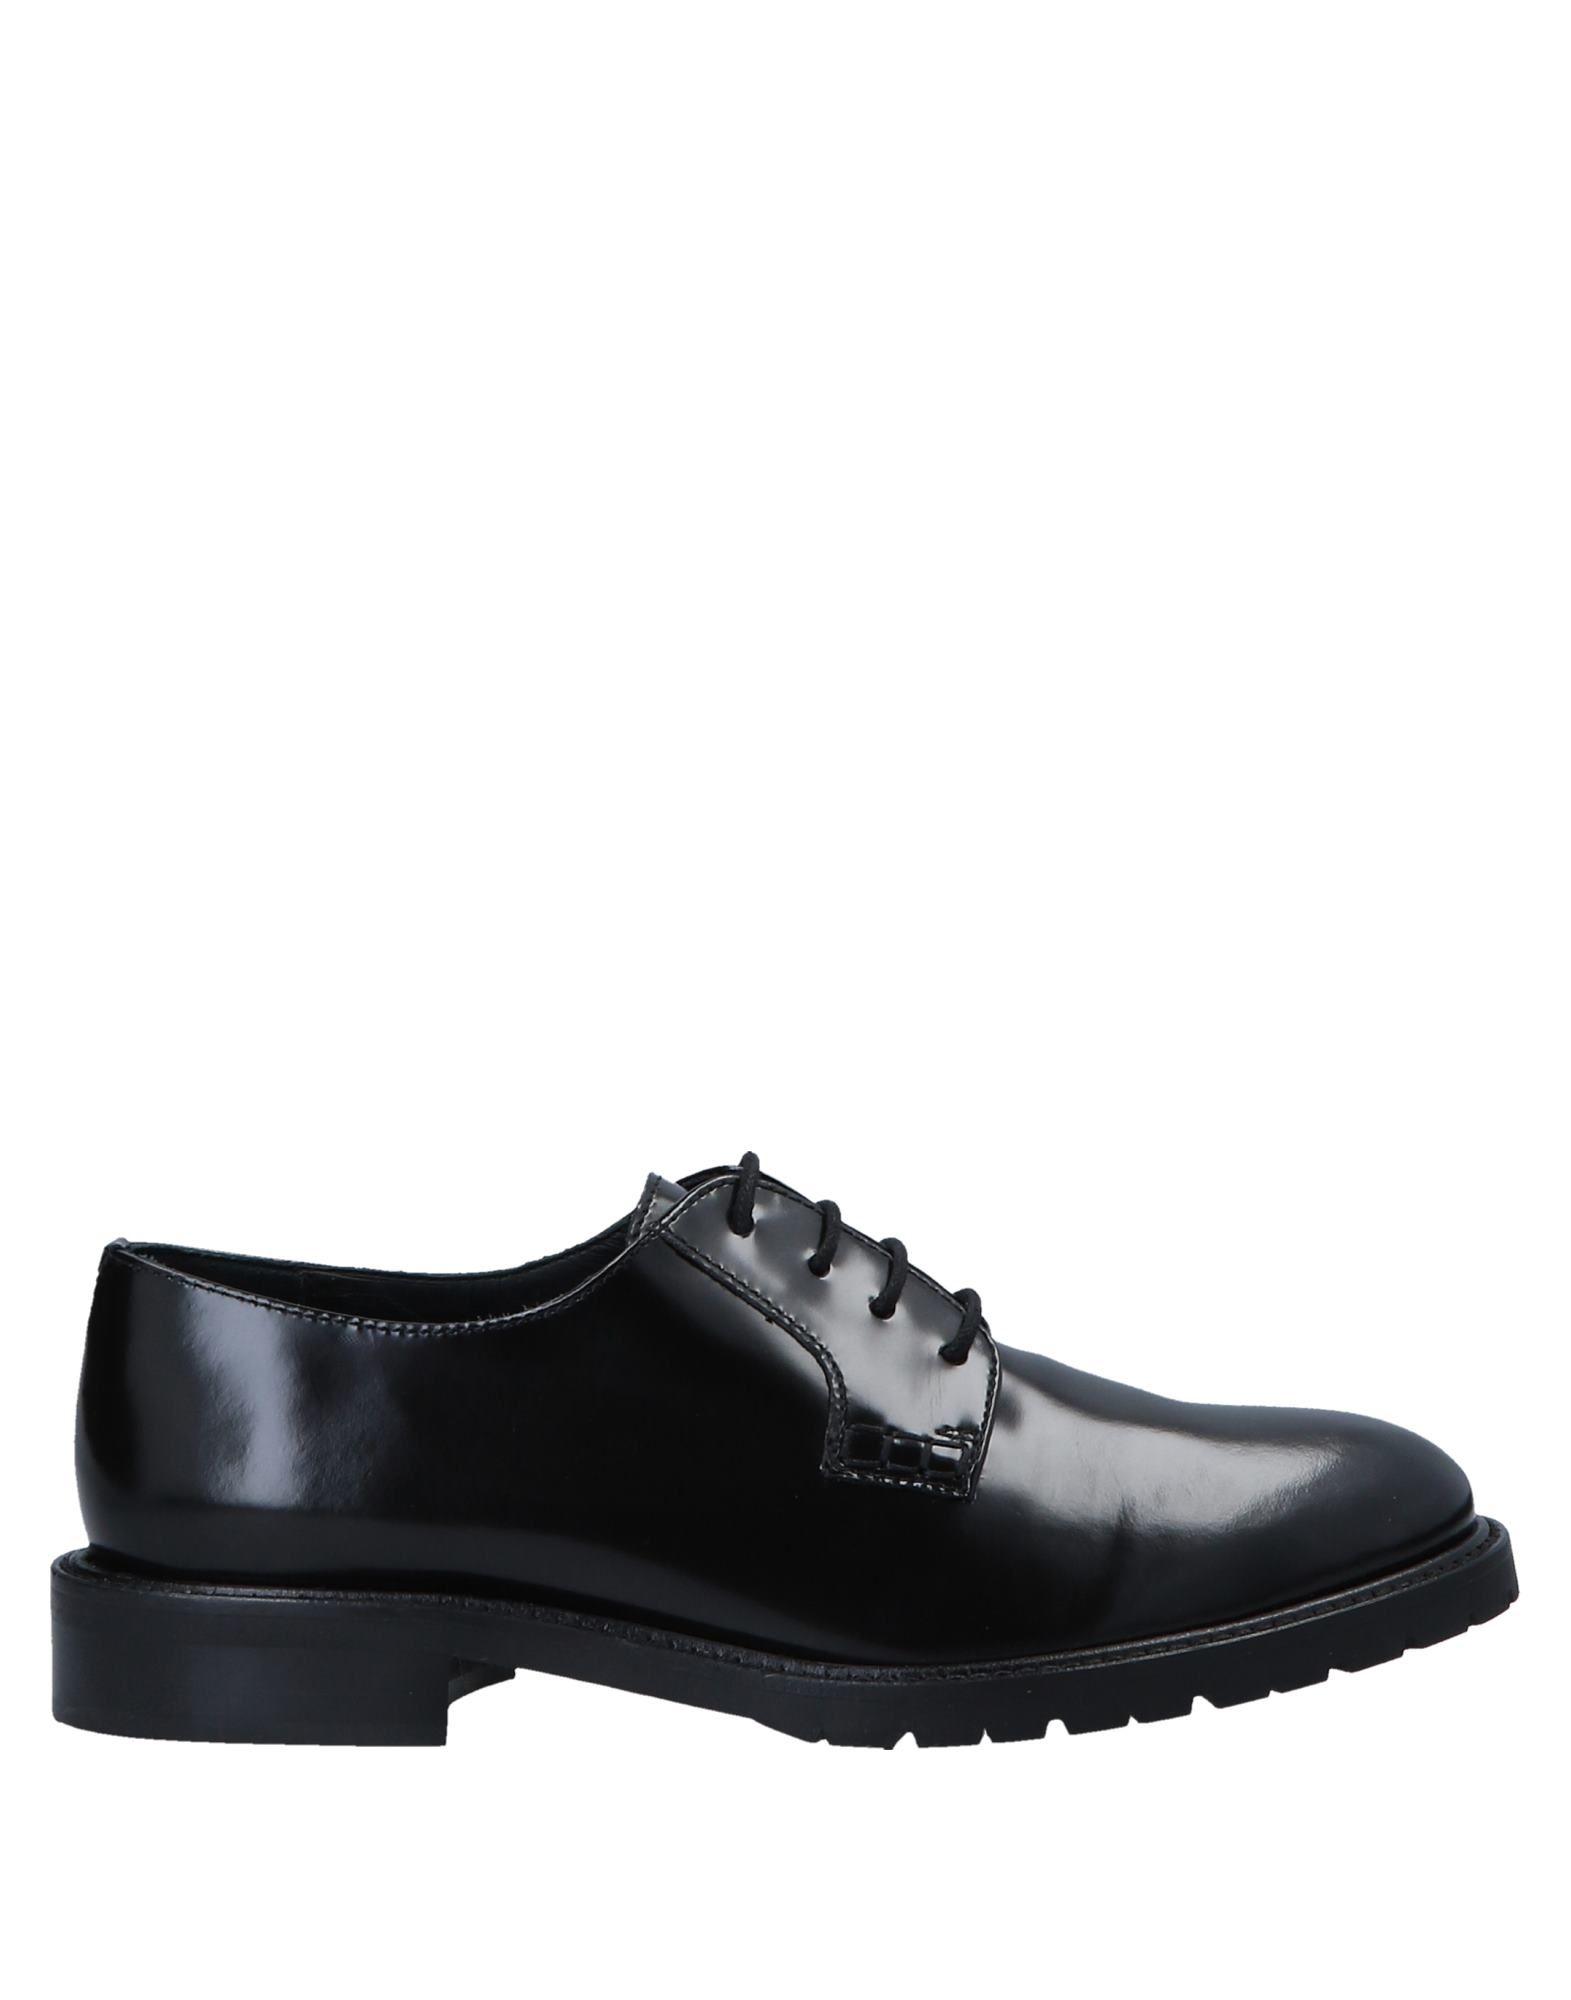 O'dan Li Schnürschuhe Damen  11548834TJ Gute Qualität beliebte Schuhe